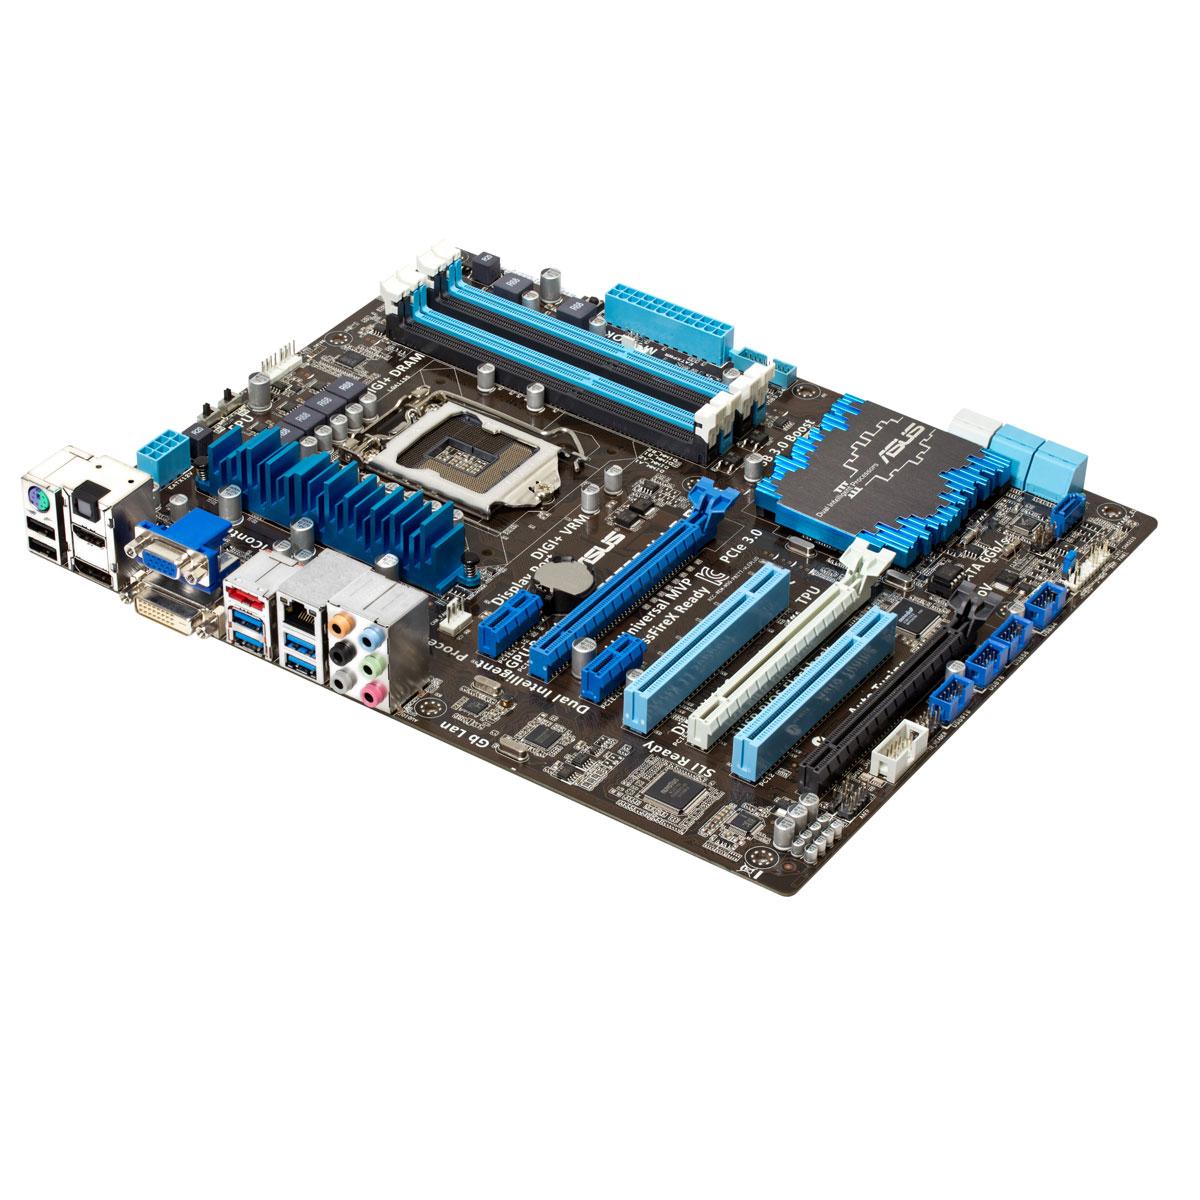 Carte mère ASUS P8Z77-V LE PLUS Carte mère ATX Socket 1155 Intel Z77 Express - SATA 6Gb/s - USB 3.0 - 2x PCI-Express 3.0 16x + 1x PCI-Express 2.0 16x